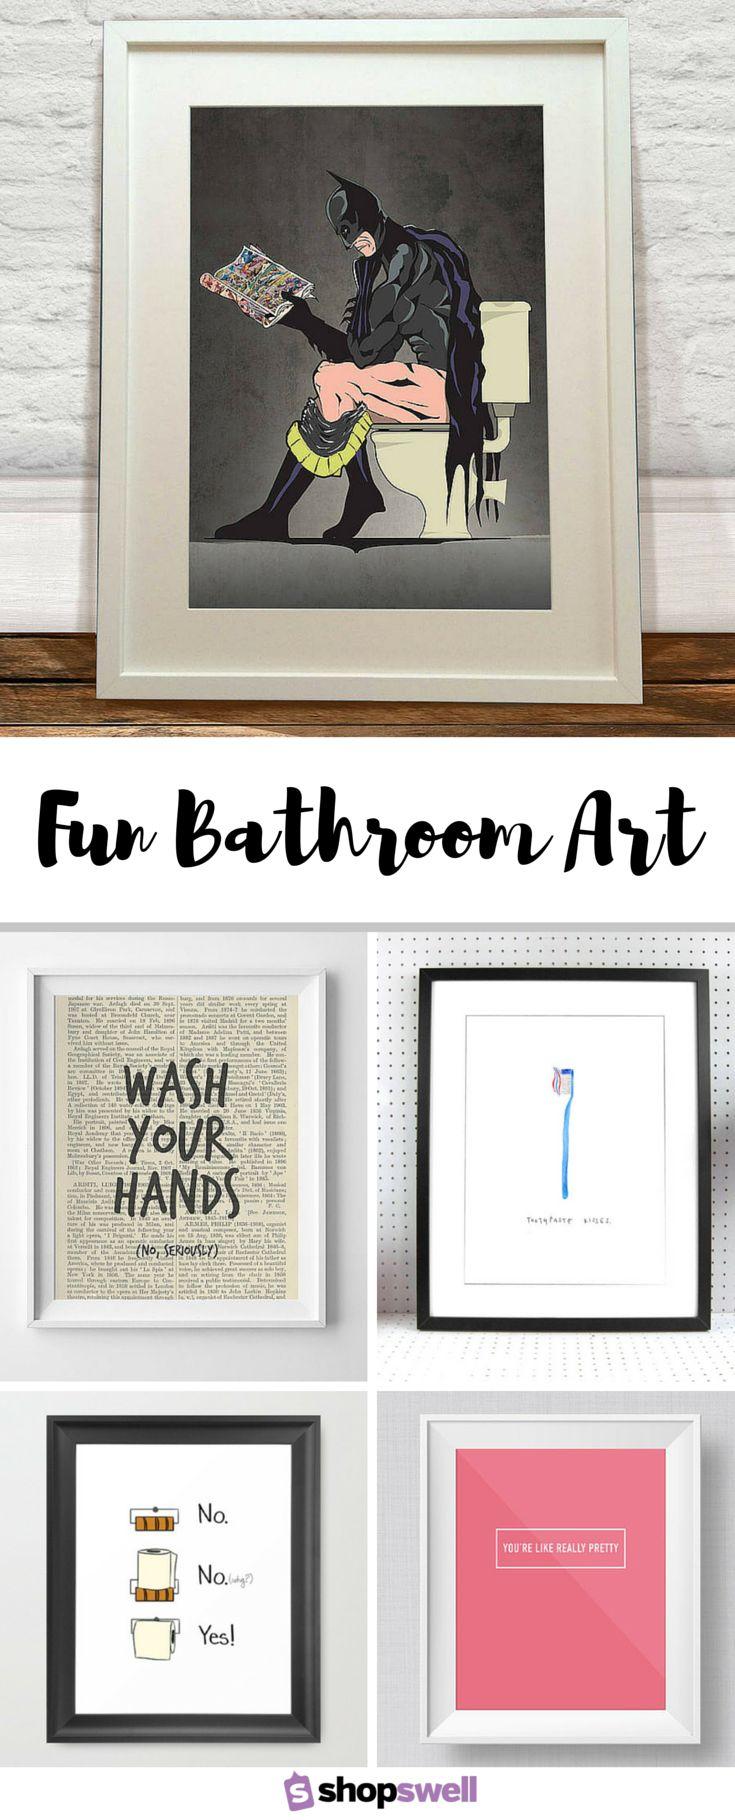 Fun bathroom art